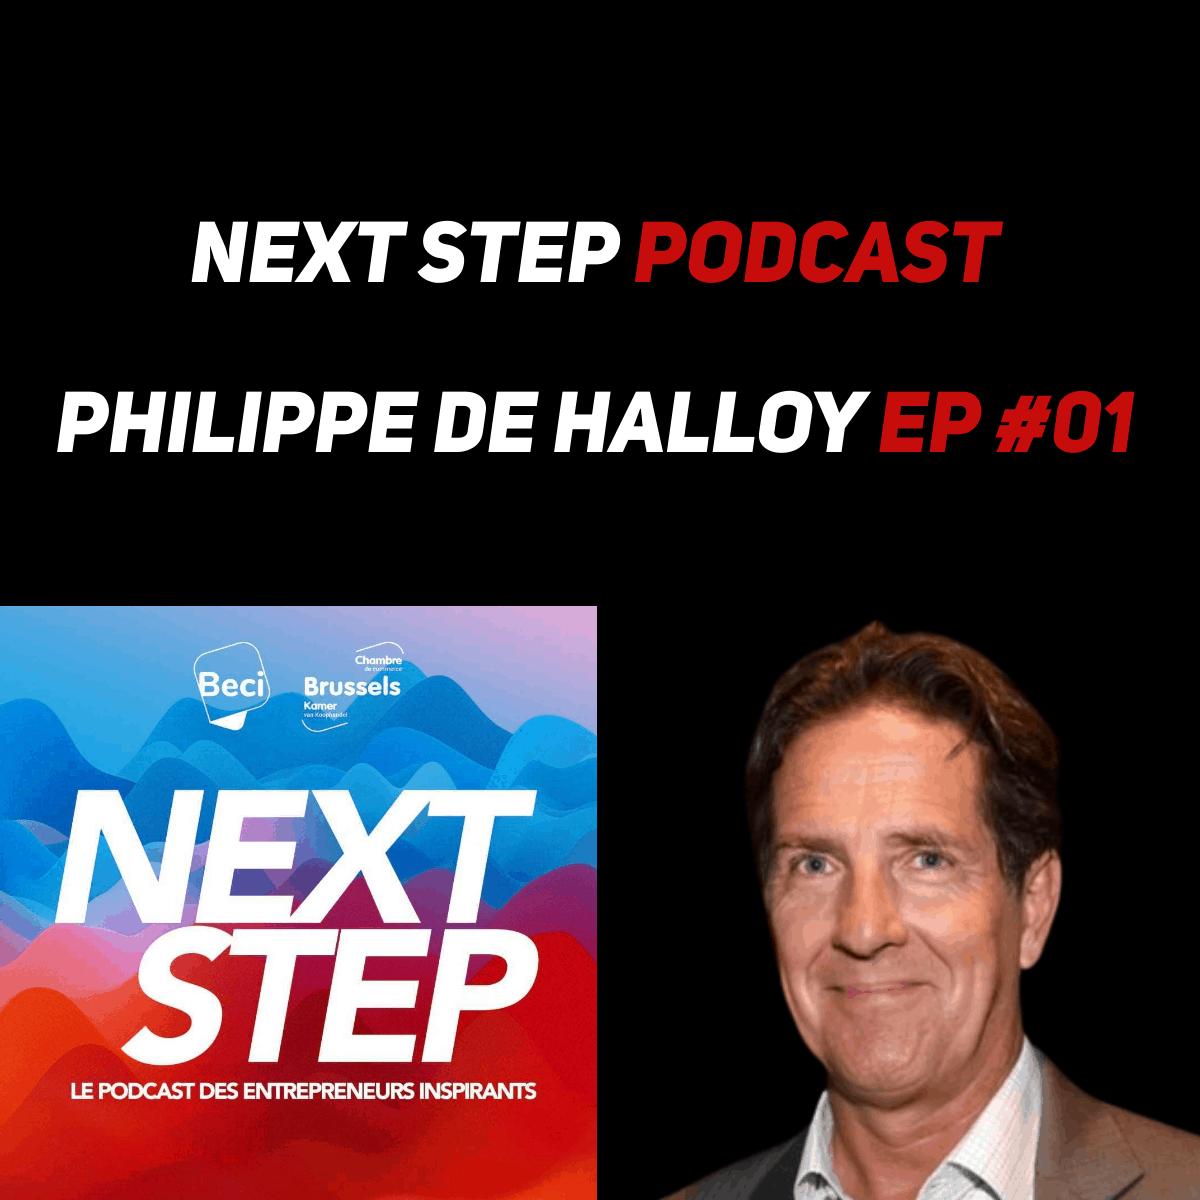 NEXT-STEP Podcast – Philippe de Halloy – EP 01